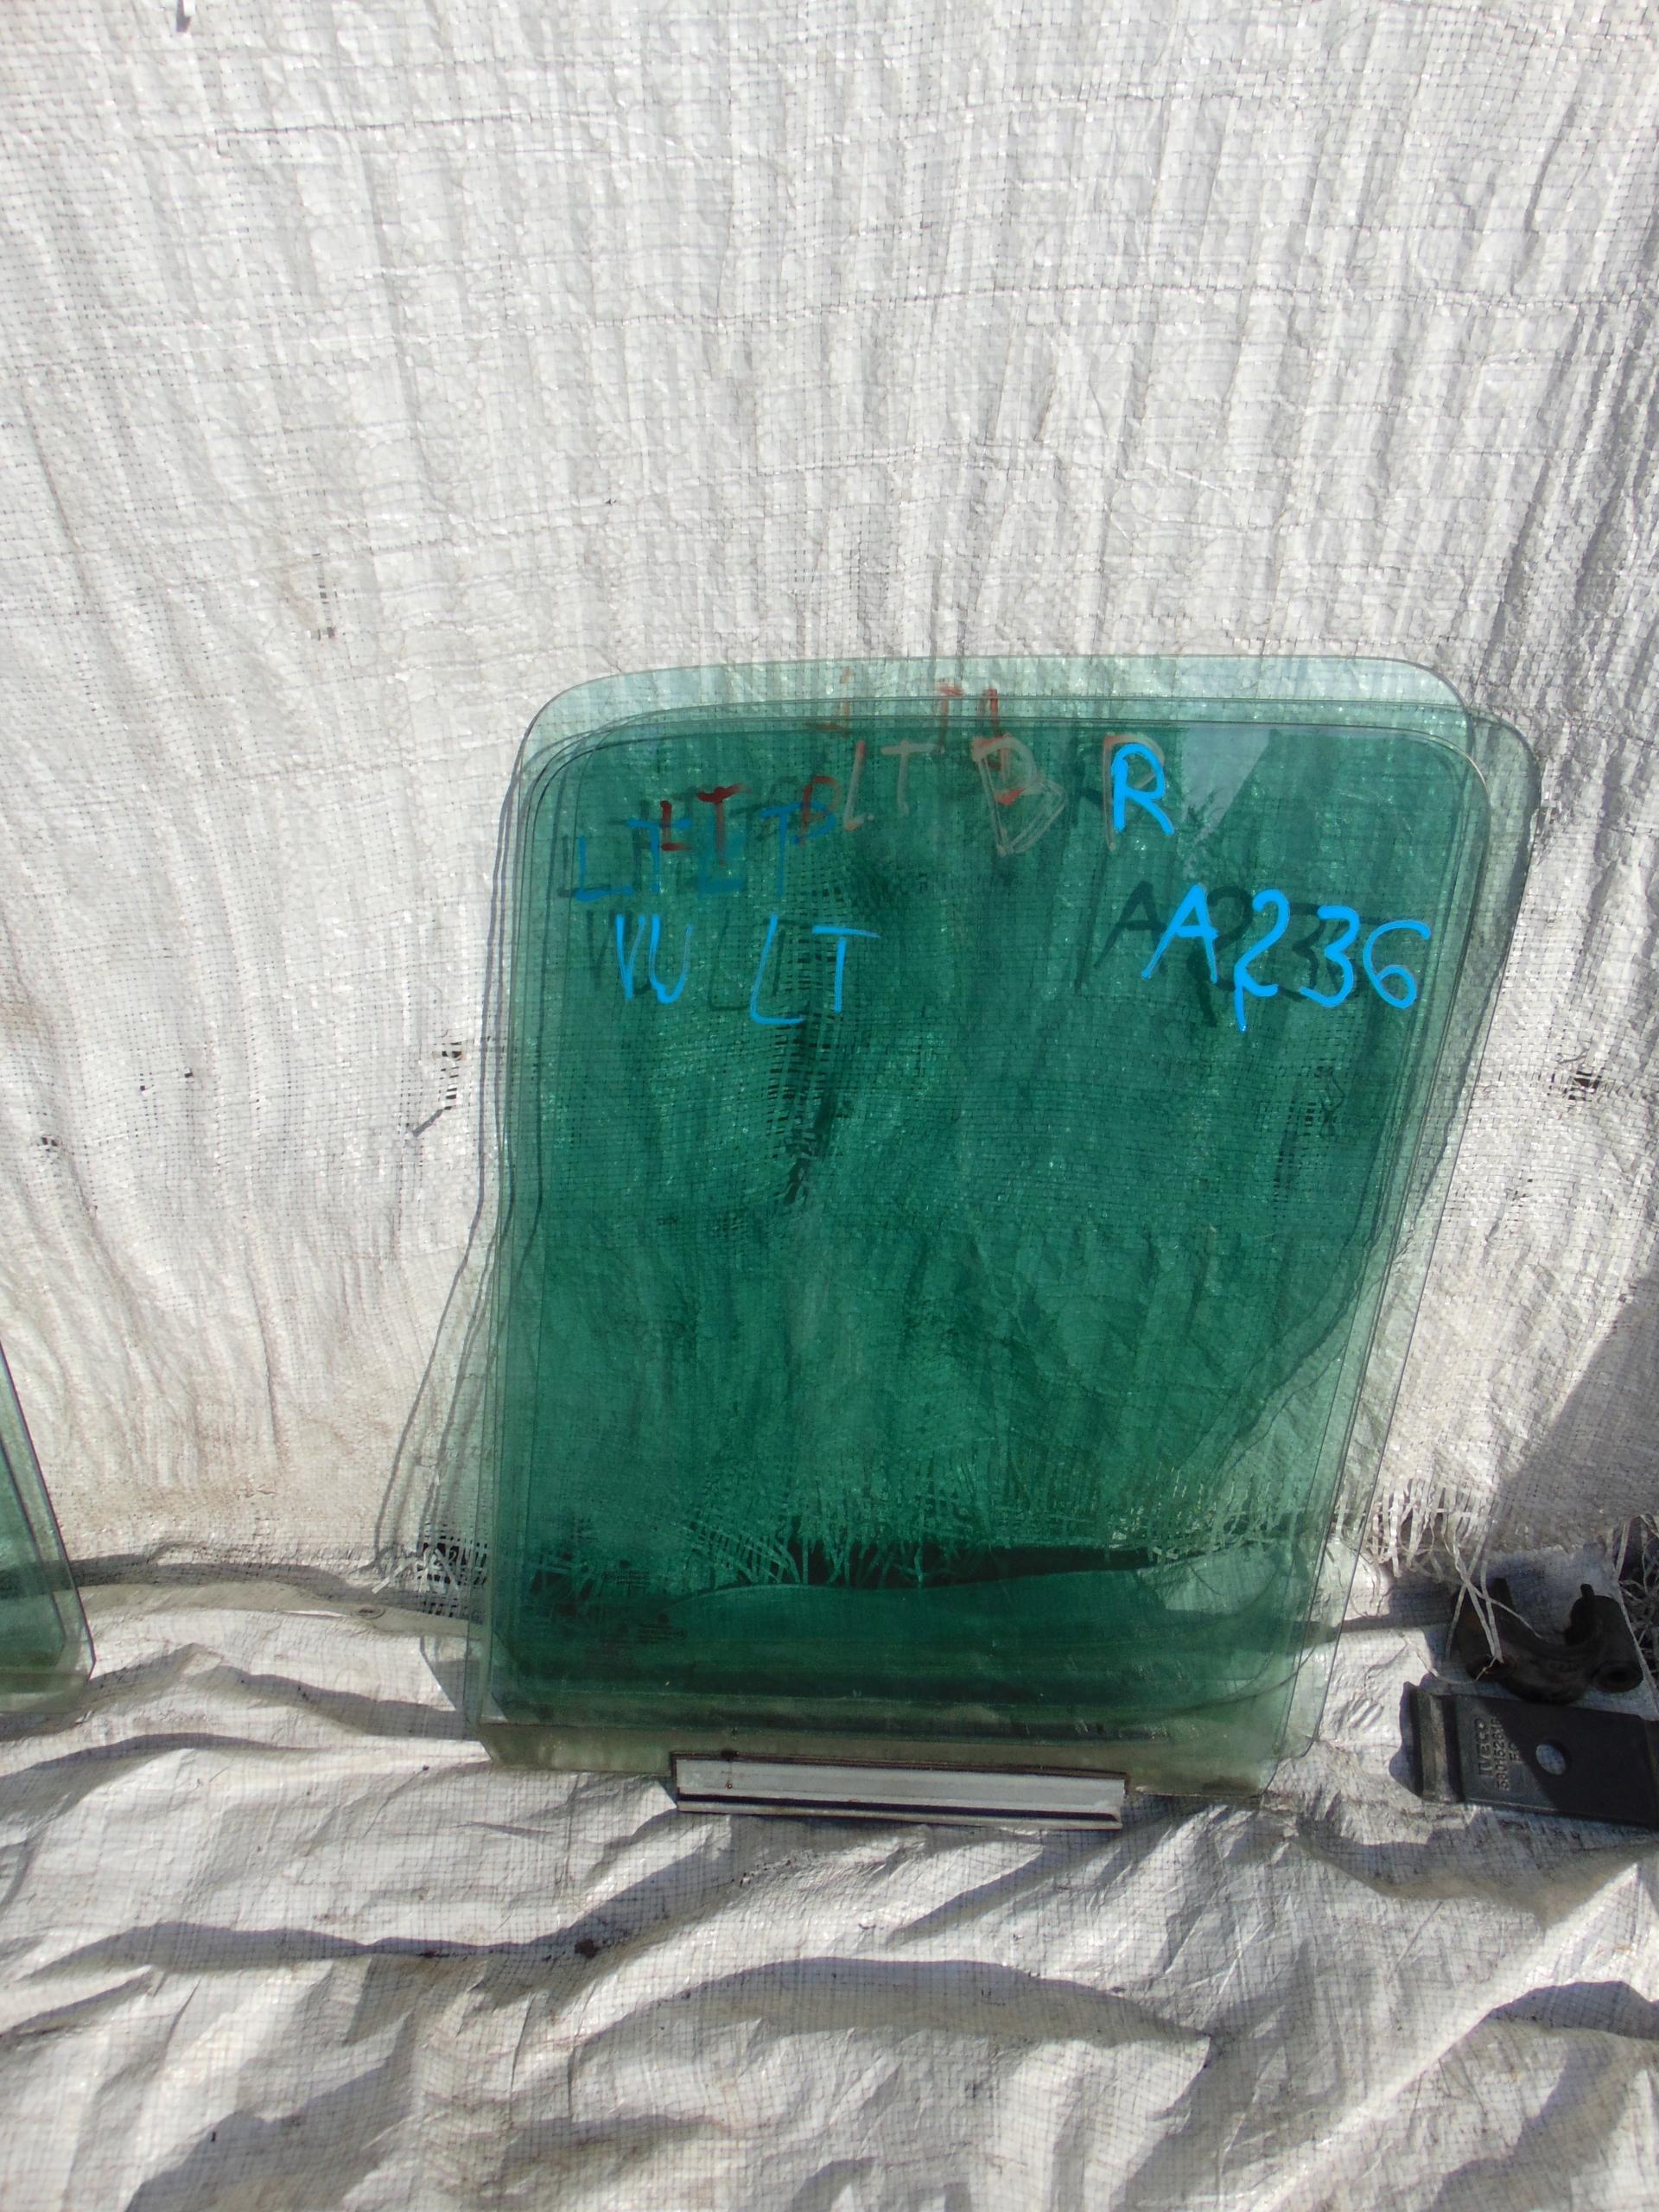 vw lt 95-06 стекло боковая двери права